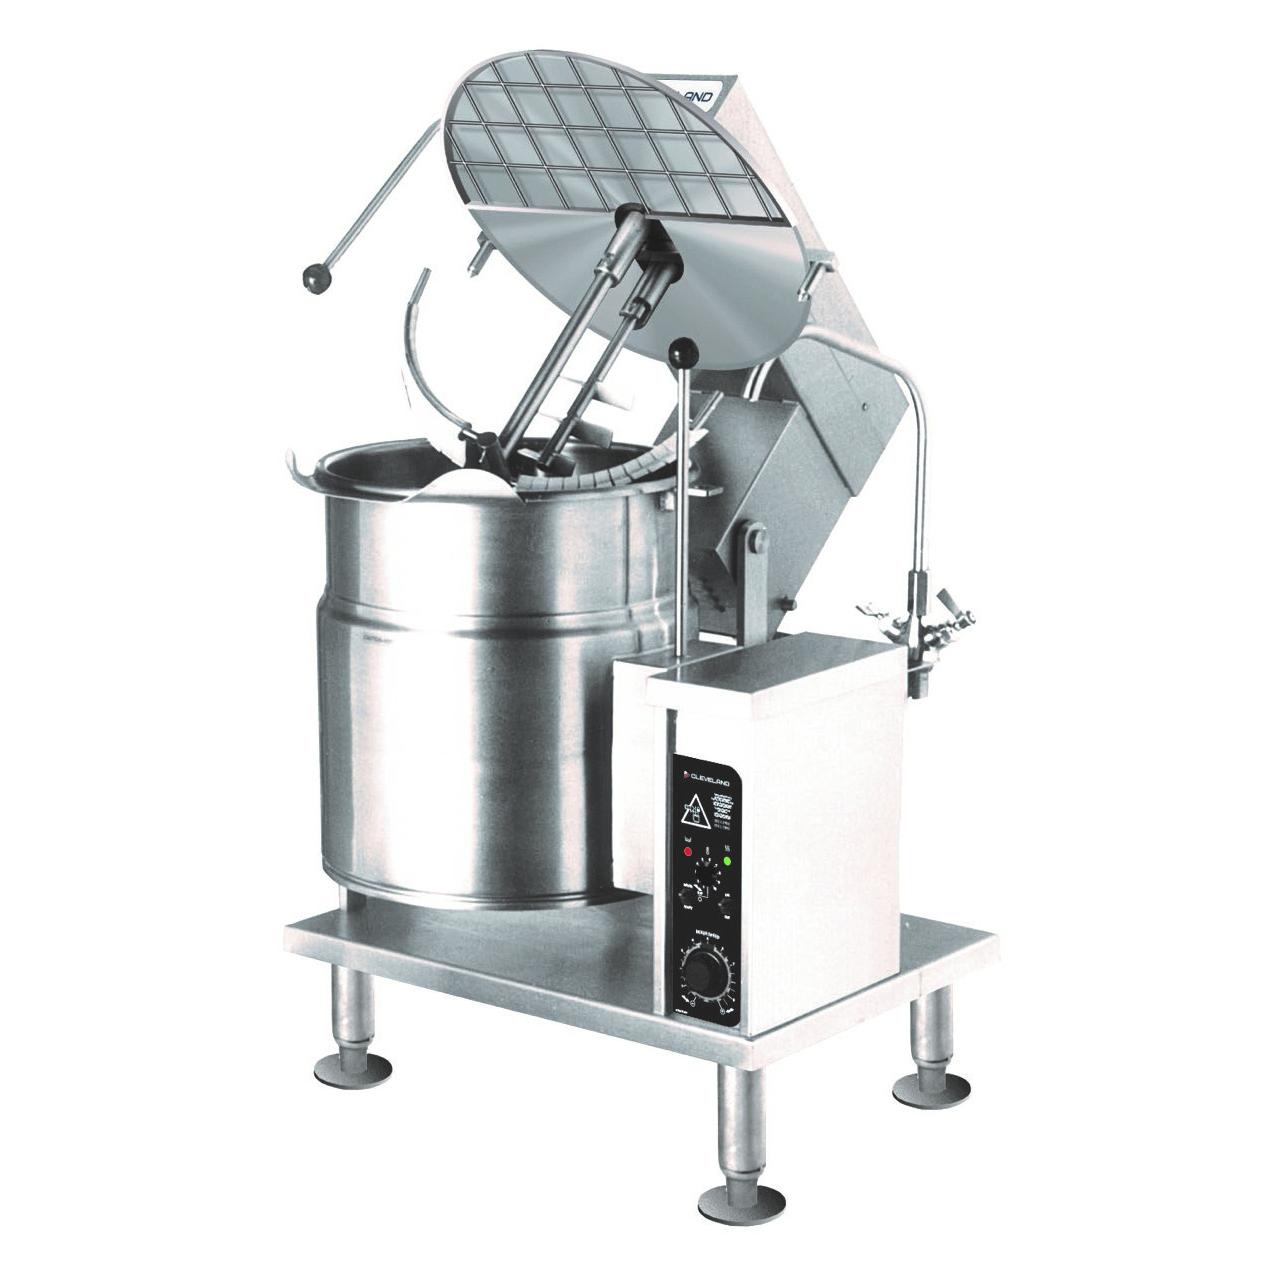 Cleveland Range MKET12T kettle mixer, electric, countertop